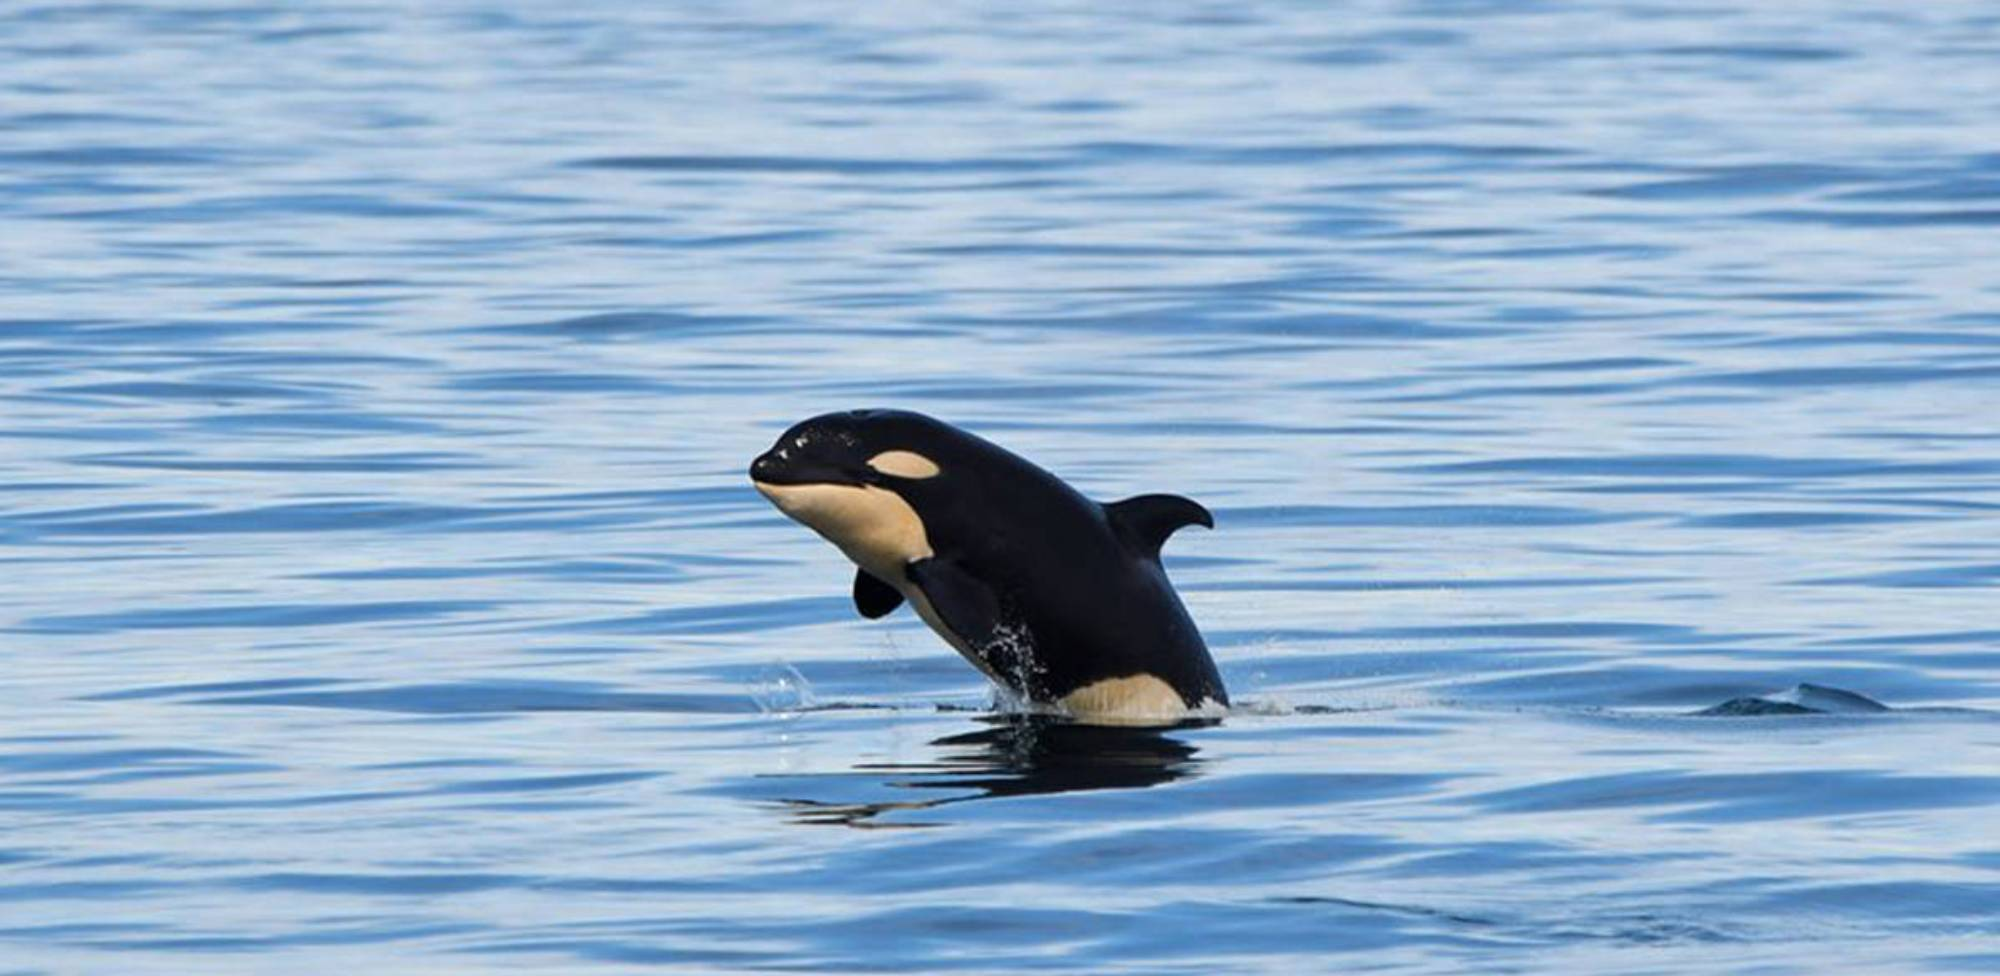 Bébé orque du sud